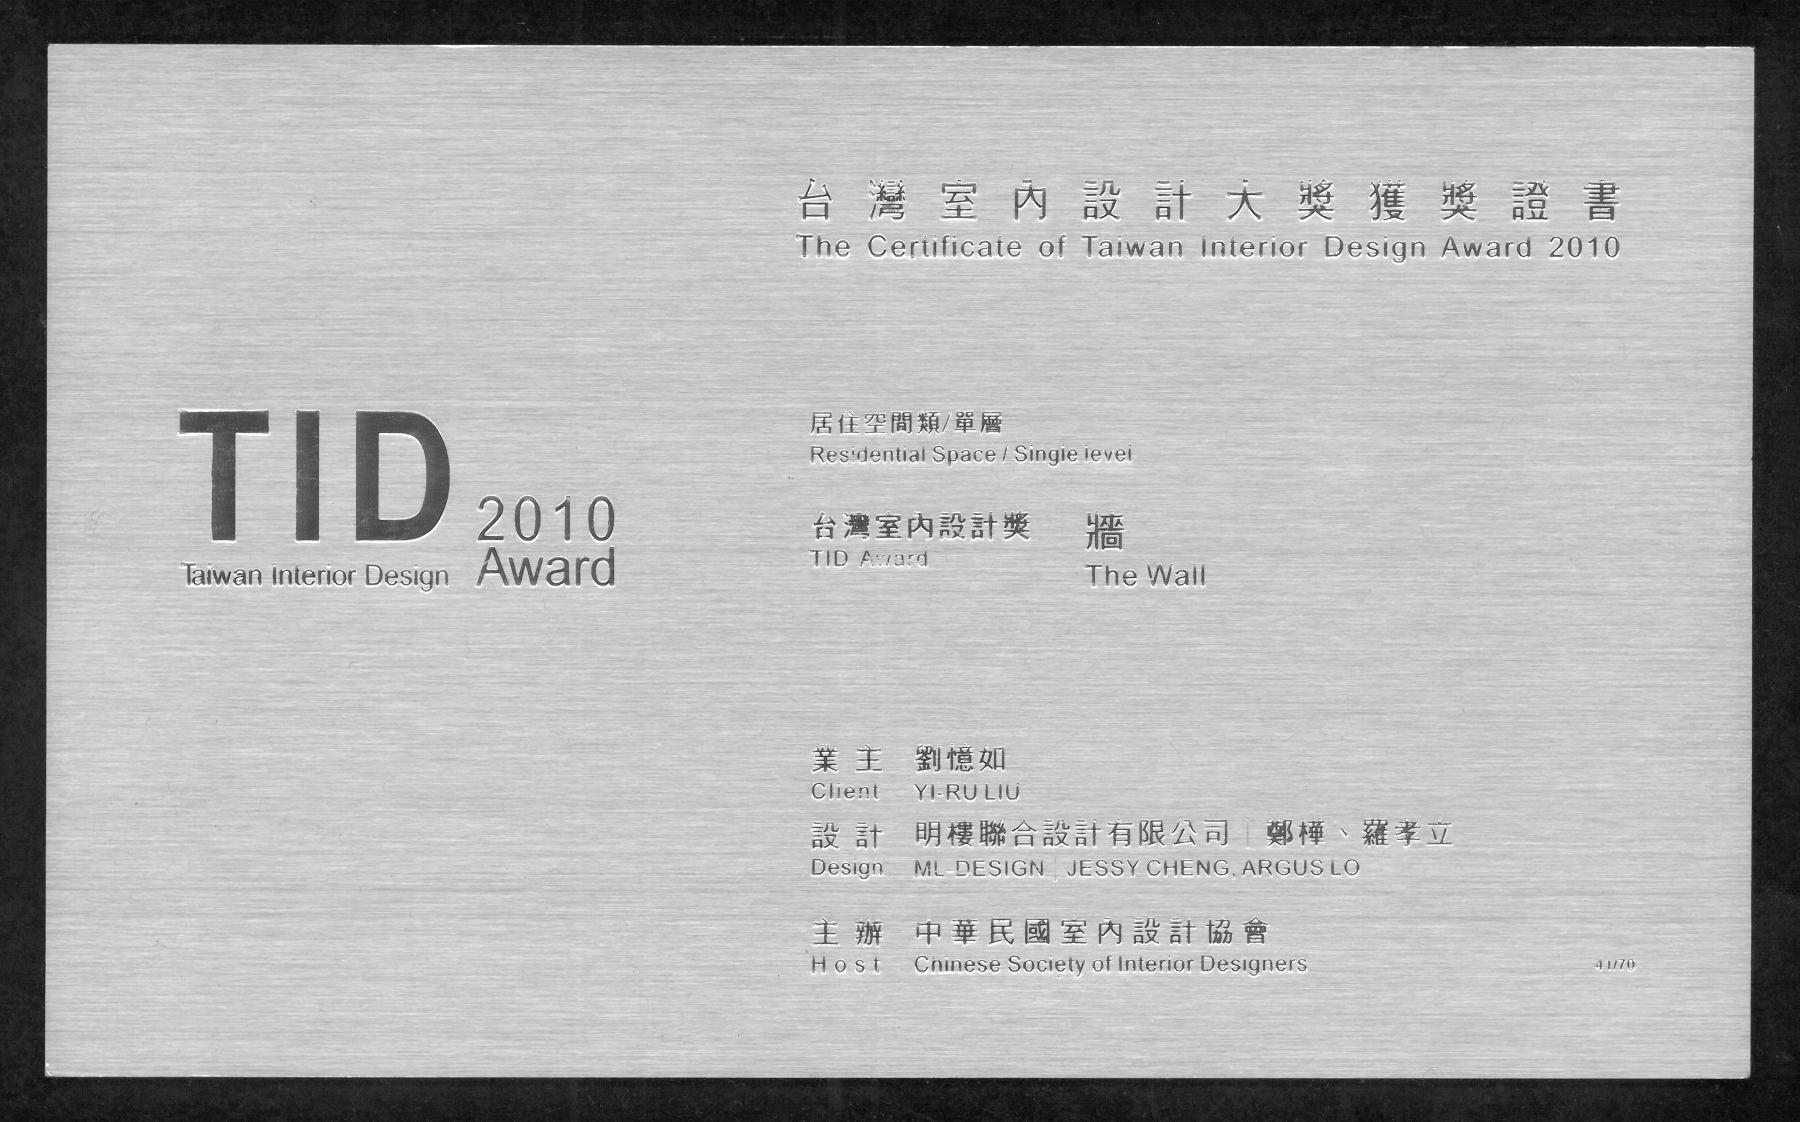 http://herguang.cp38.secserverpros.com/storage/awards/May2019/2010-白宮-TID證書2.jpg